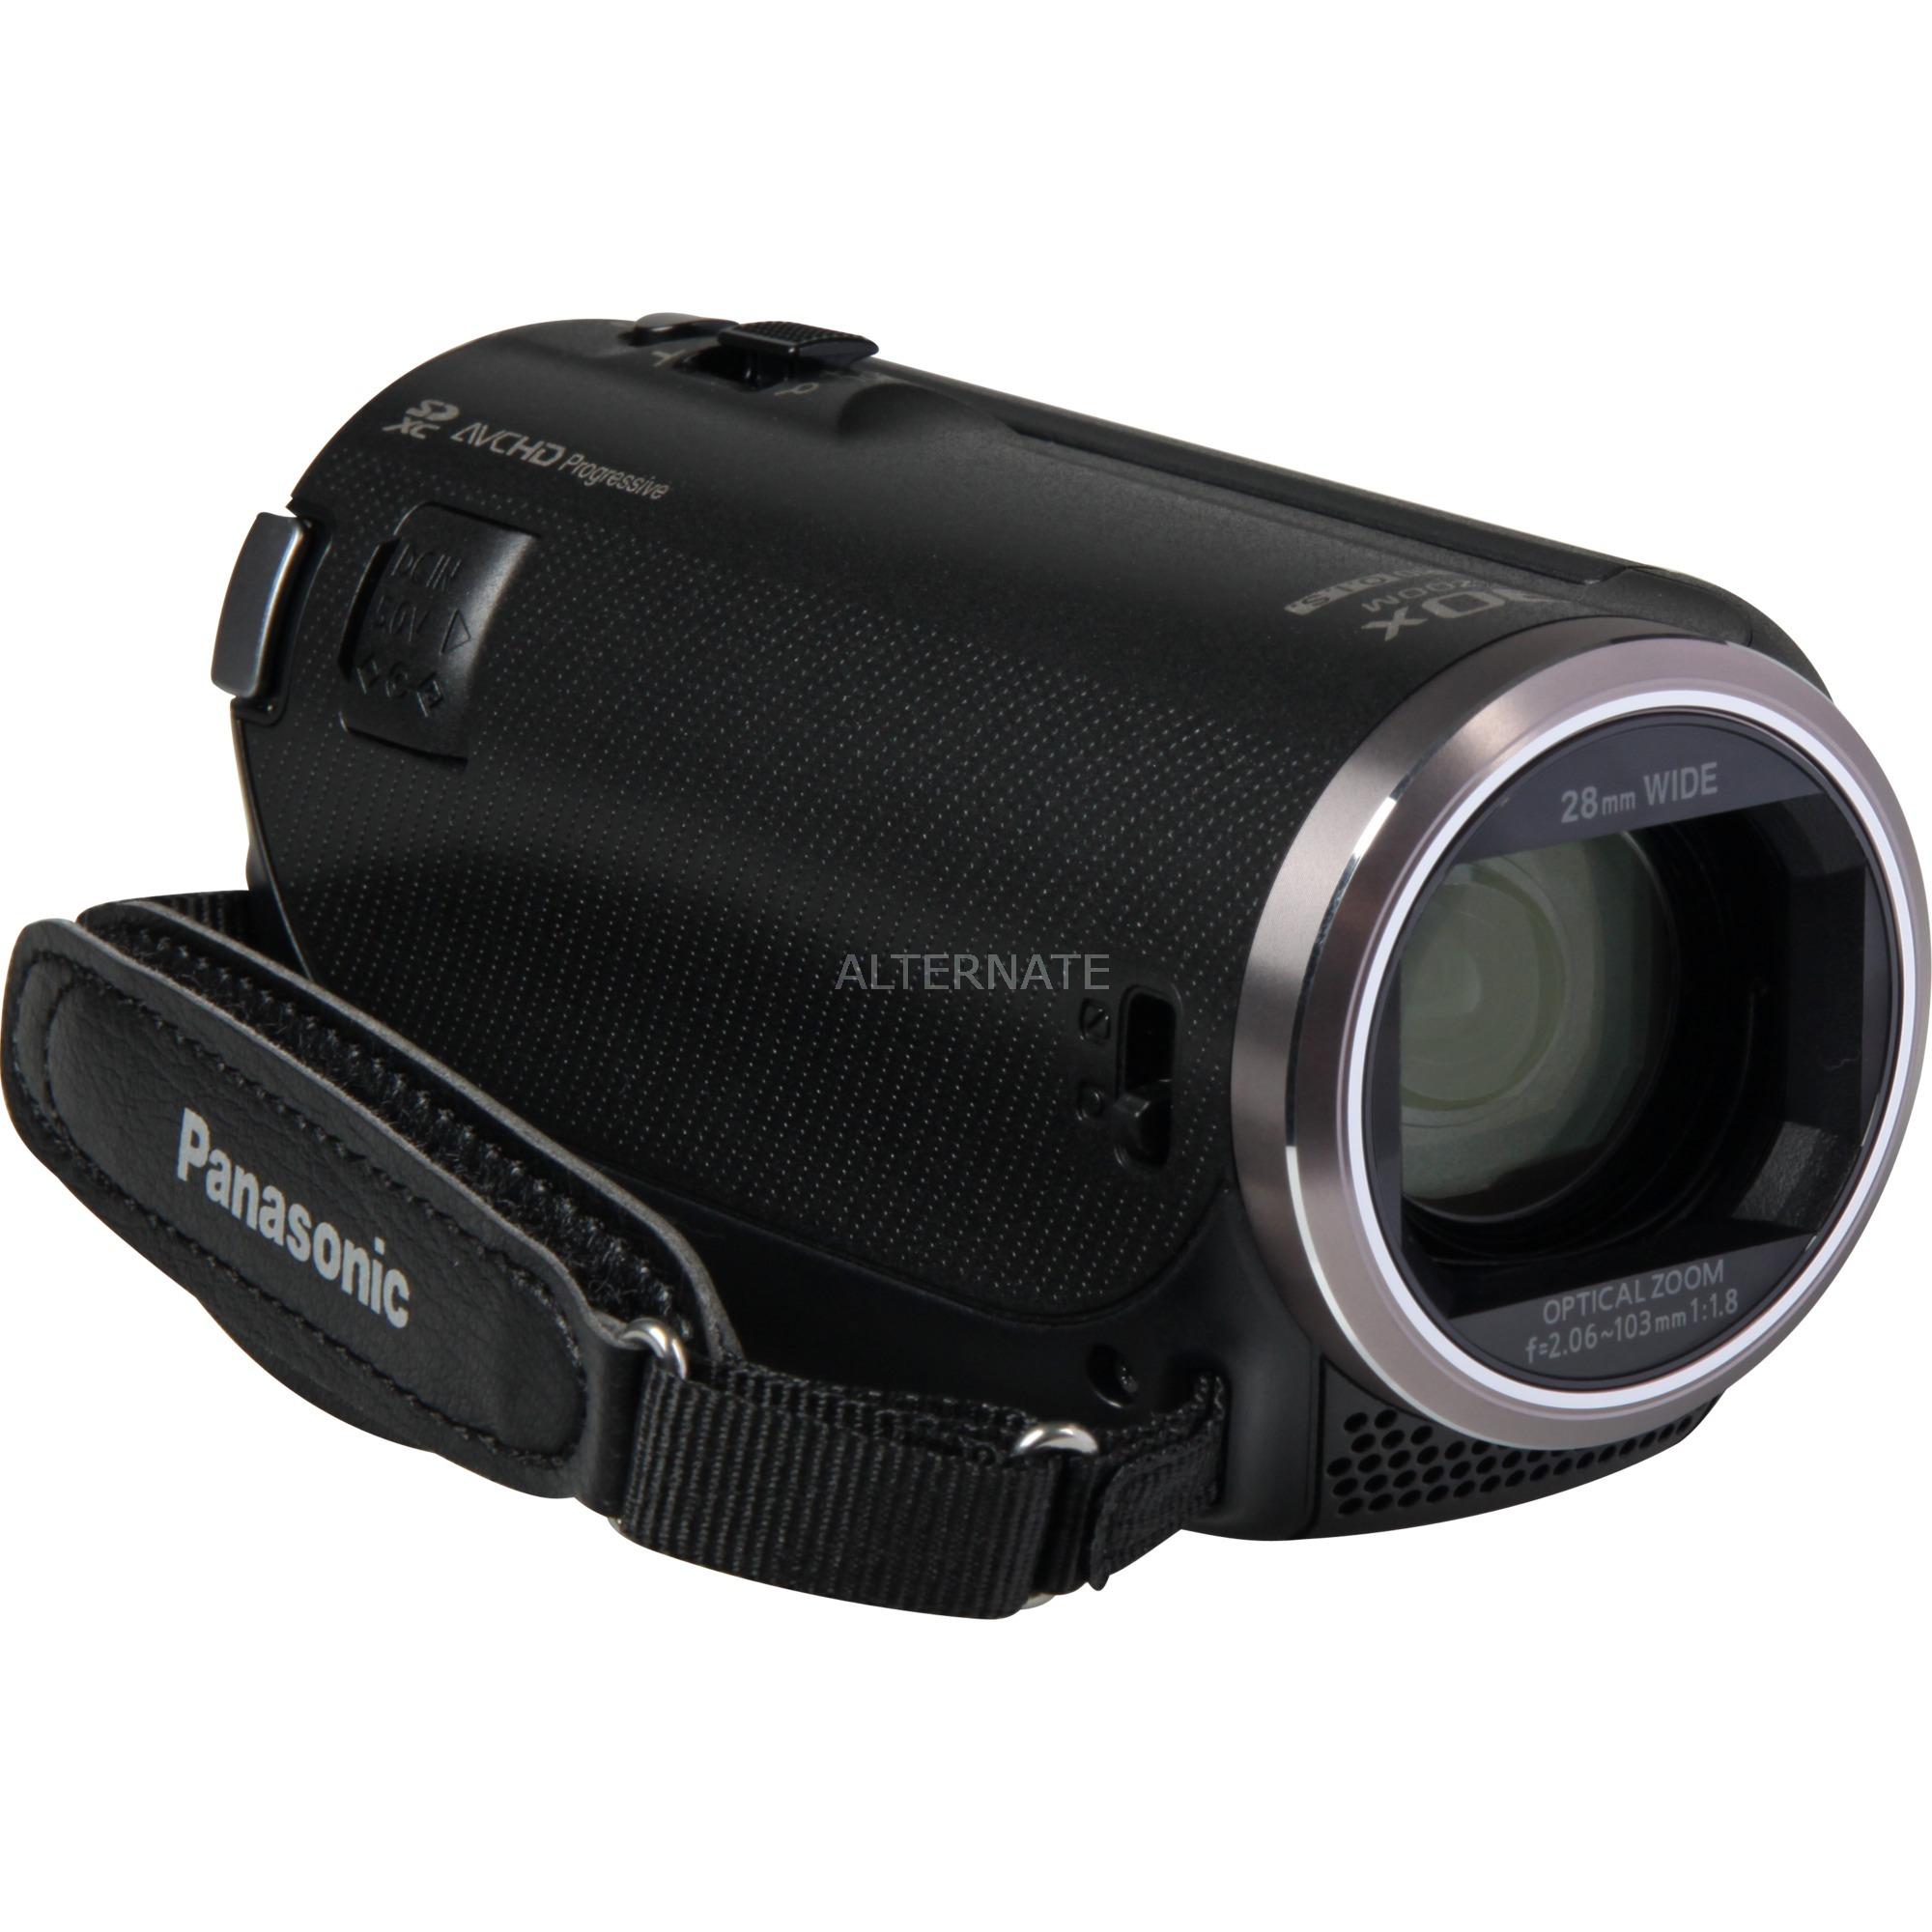 HC-V180EG-K soporte de videocámara 2,51 MP MOS BSI Videocámara manual Negro Full HD, Cámara de vídeo